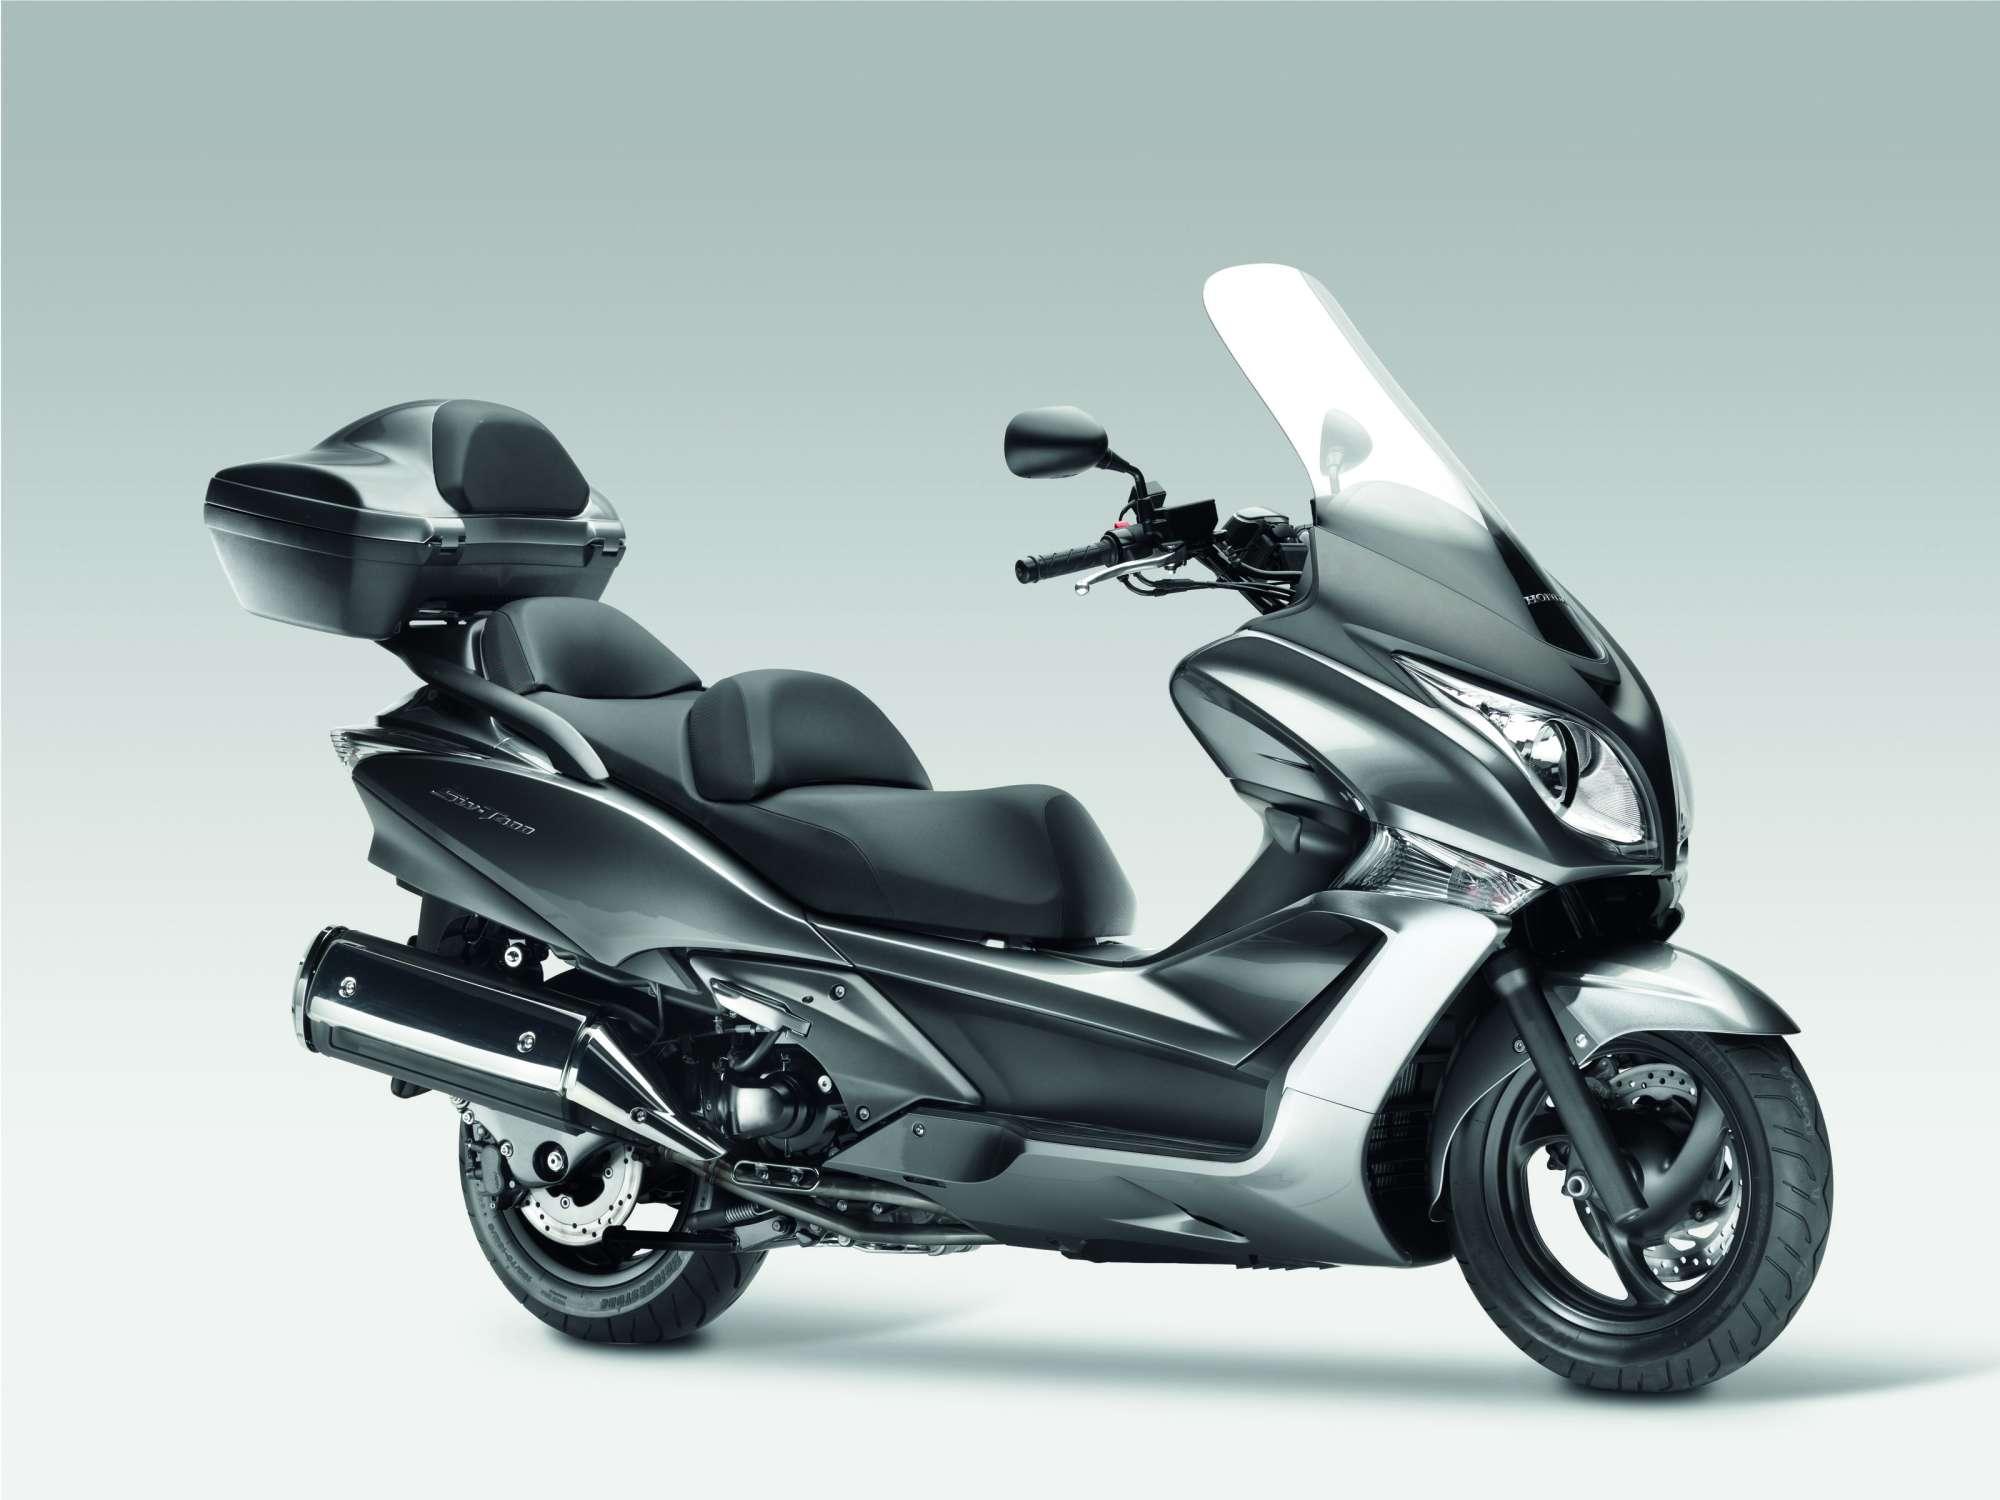 gebrauchte motorroller gebrauchte honda motorroller 125. Black Bedroom Furniture Sets. Home Design Ideas